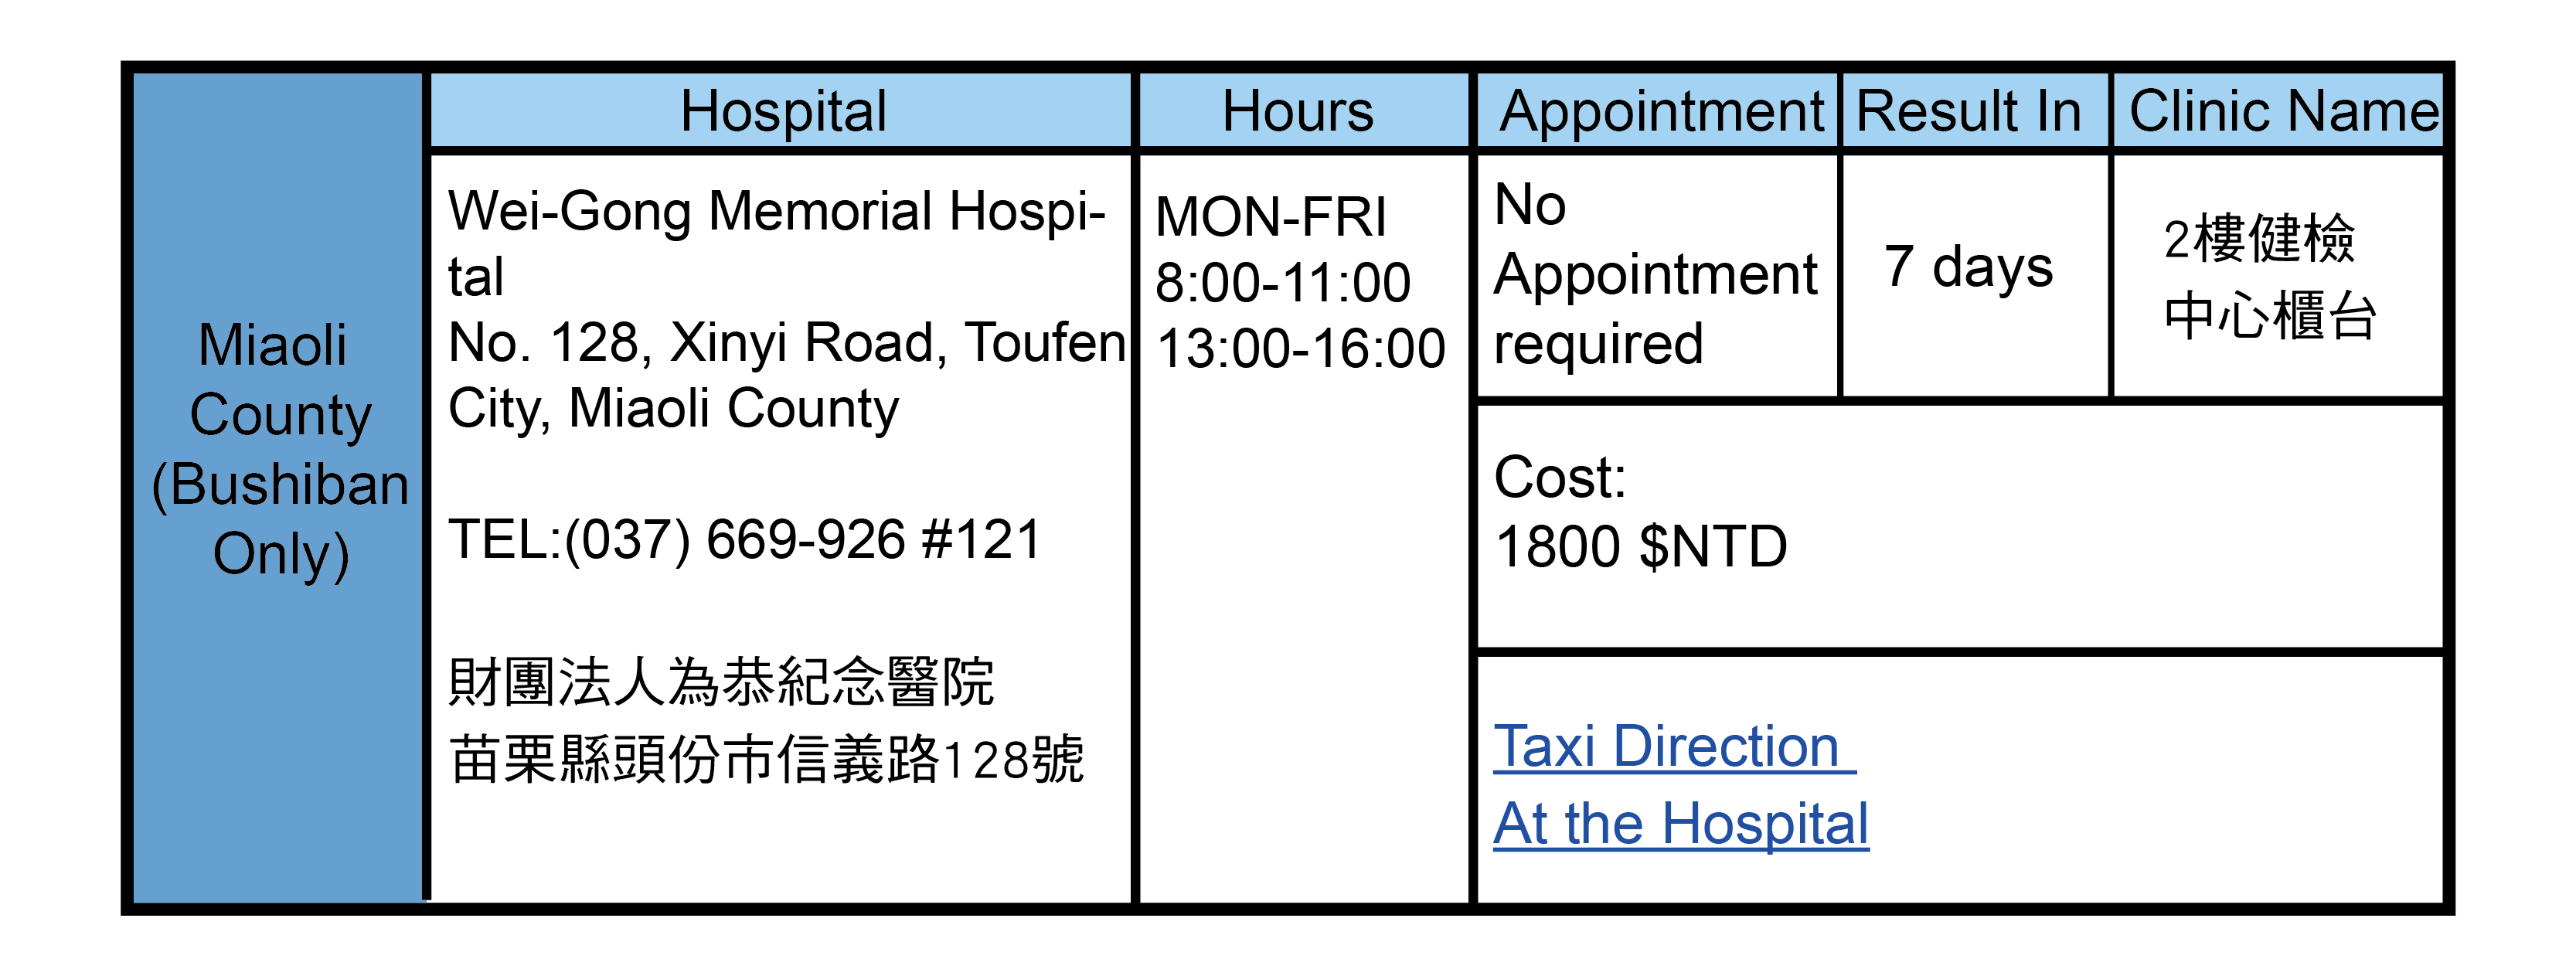 Miaoli County, Taiwan Health Check Hospitals Addresses